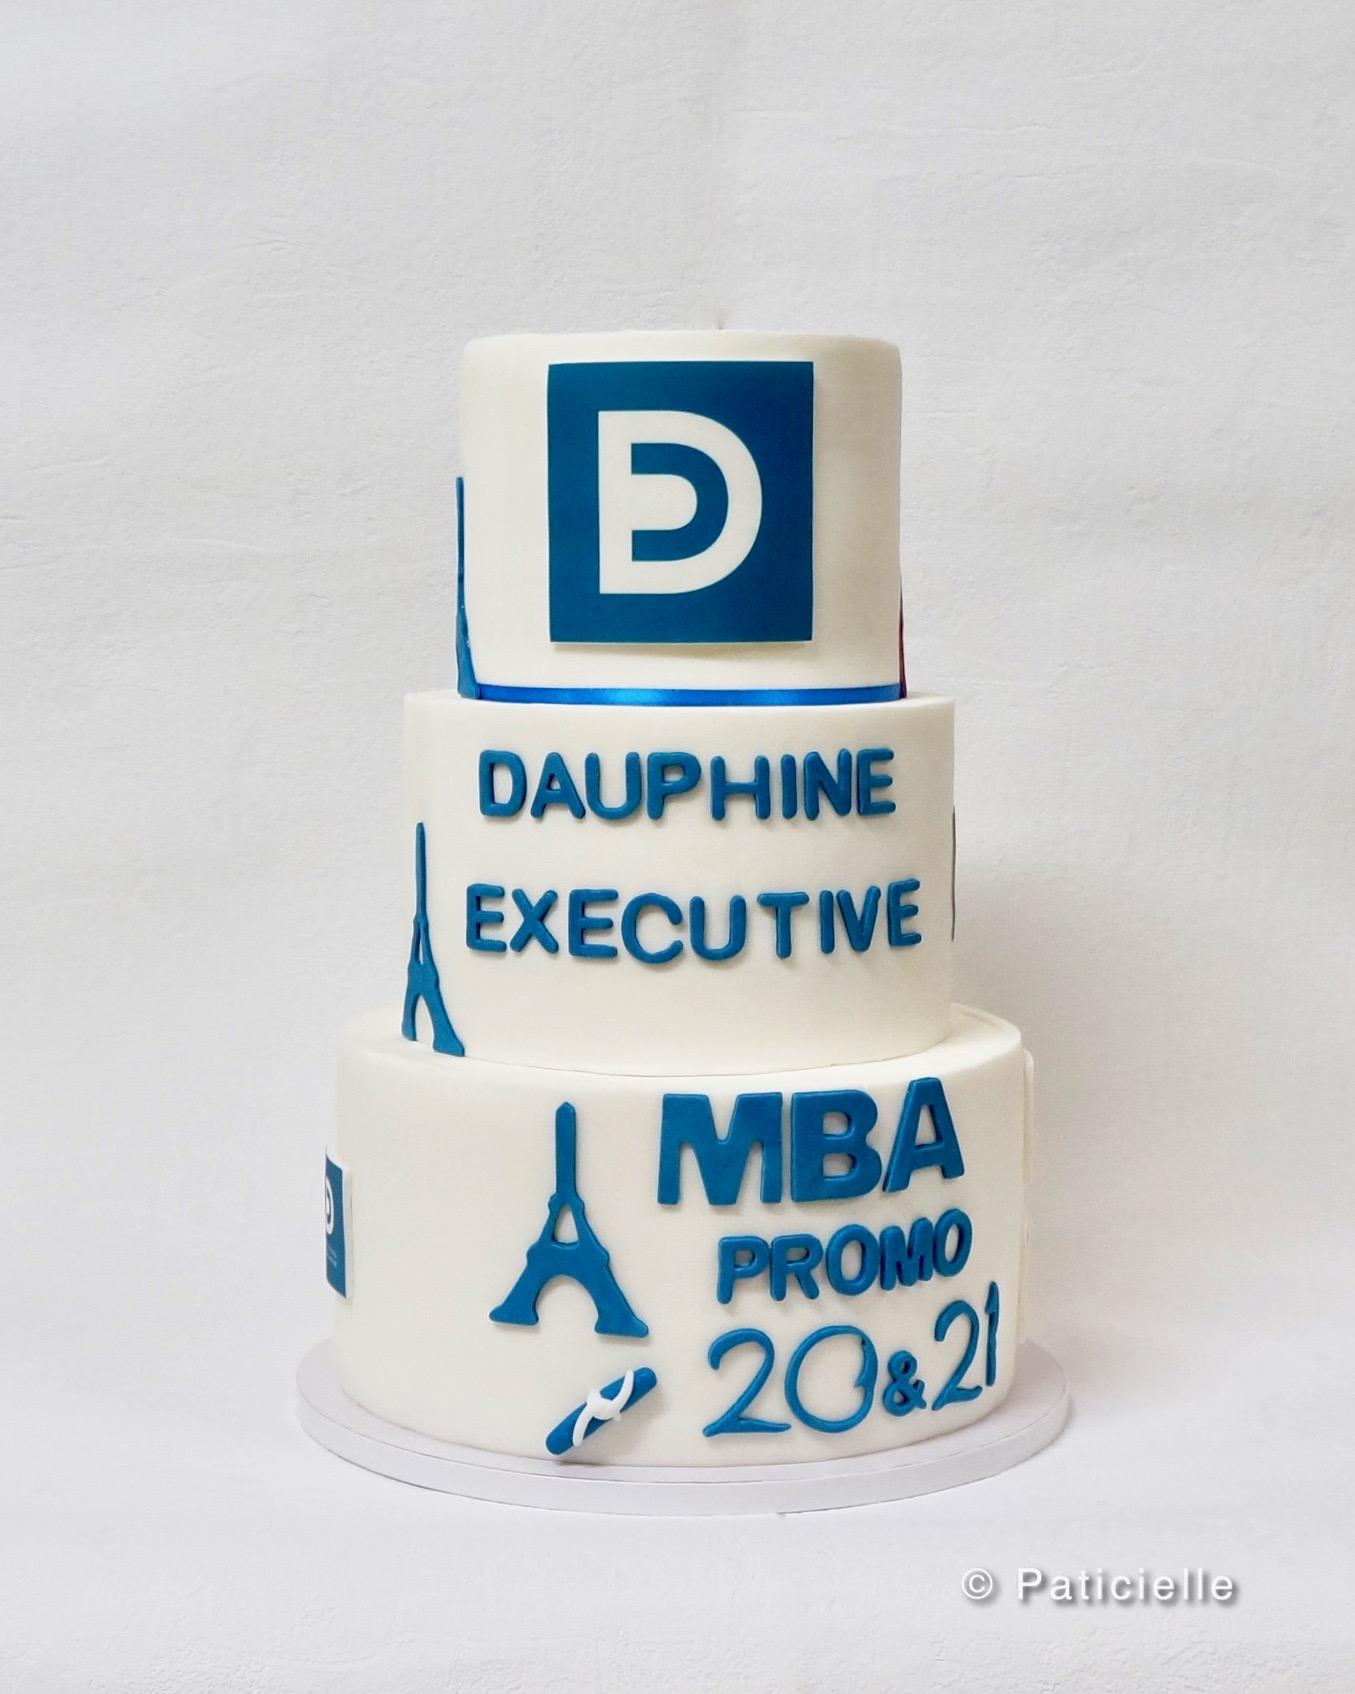 gâteau pour école mba dauphine gâteau corporate paris kinshasa